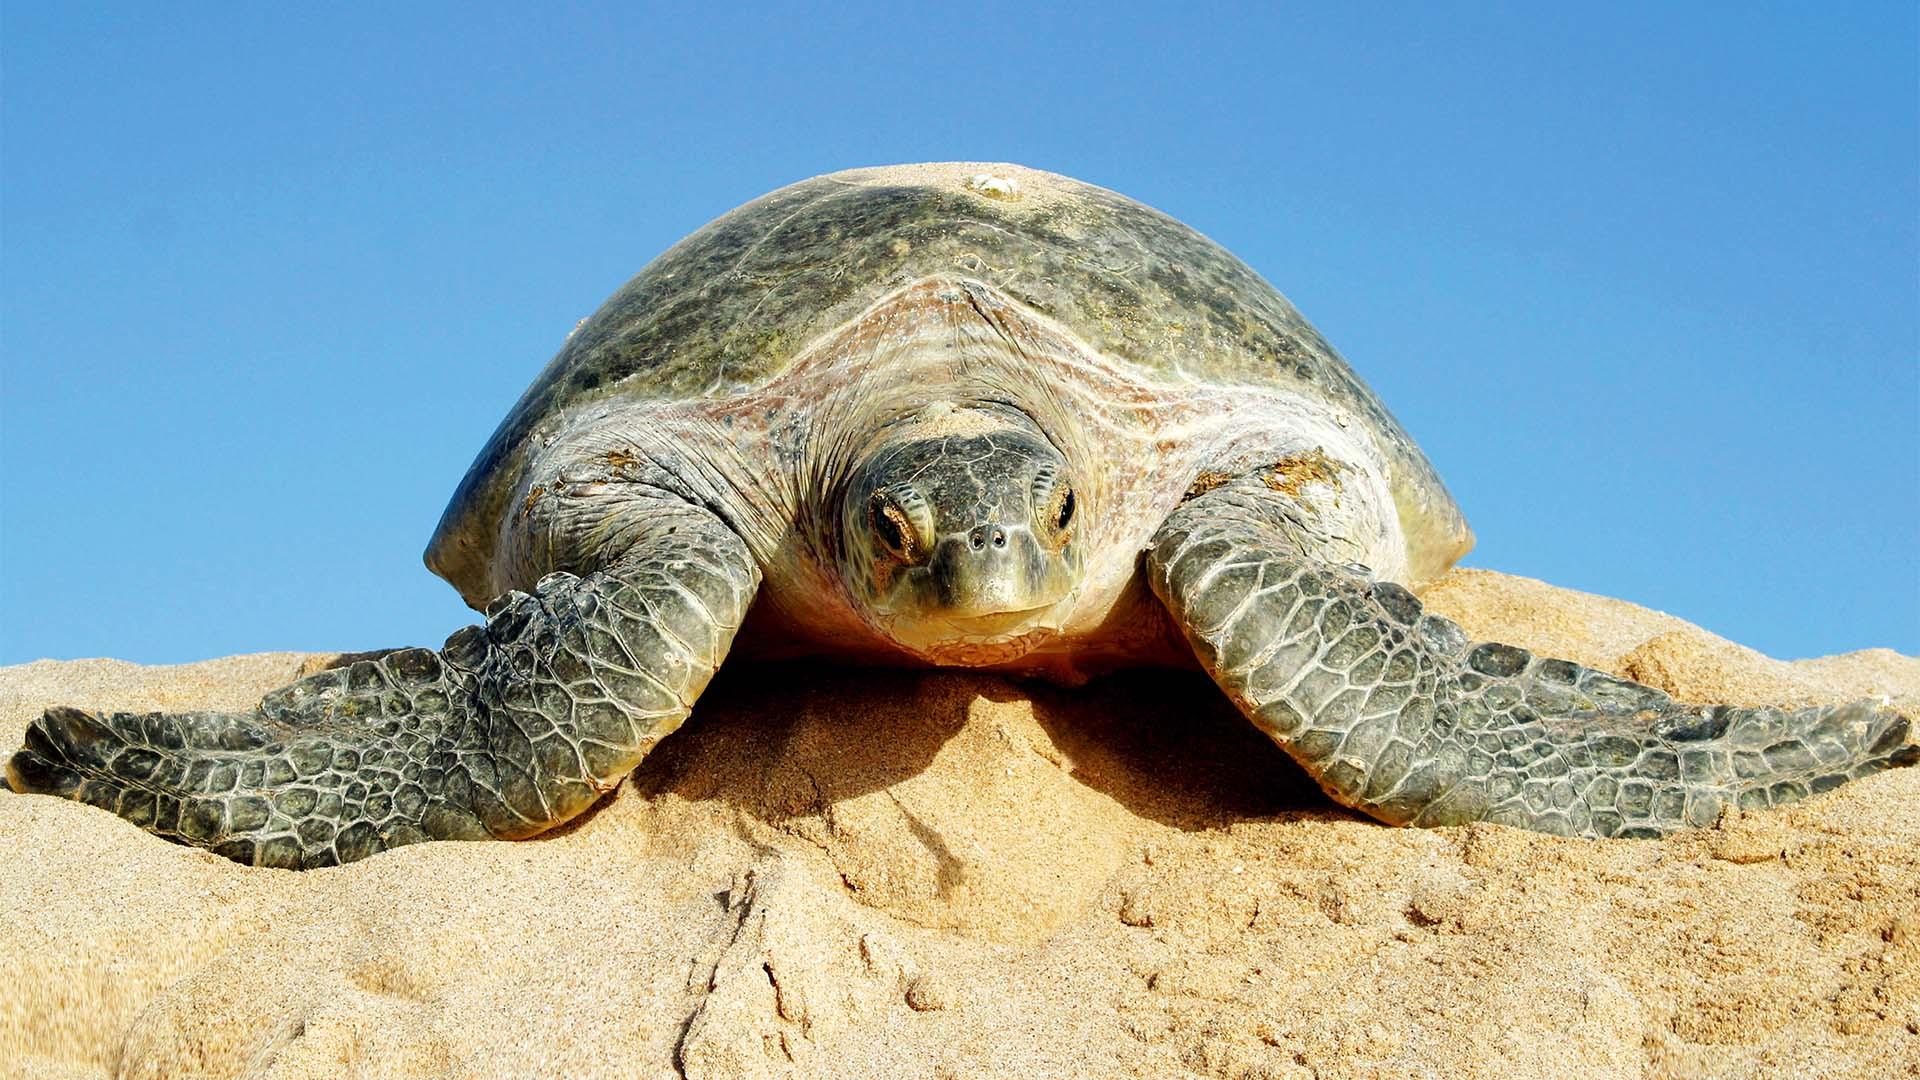 Green turtle at Ras Al Jinz, Oman